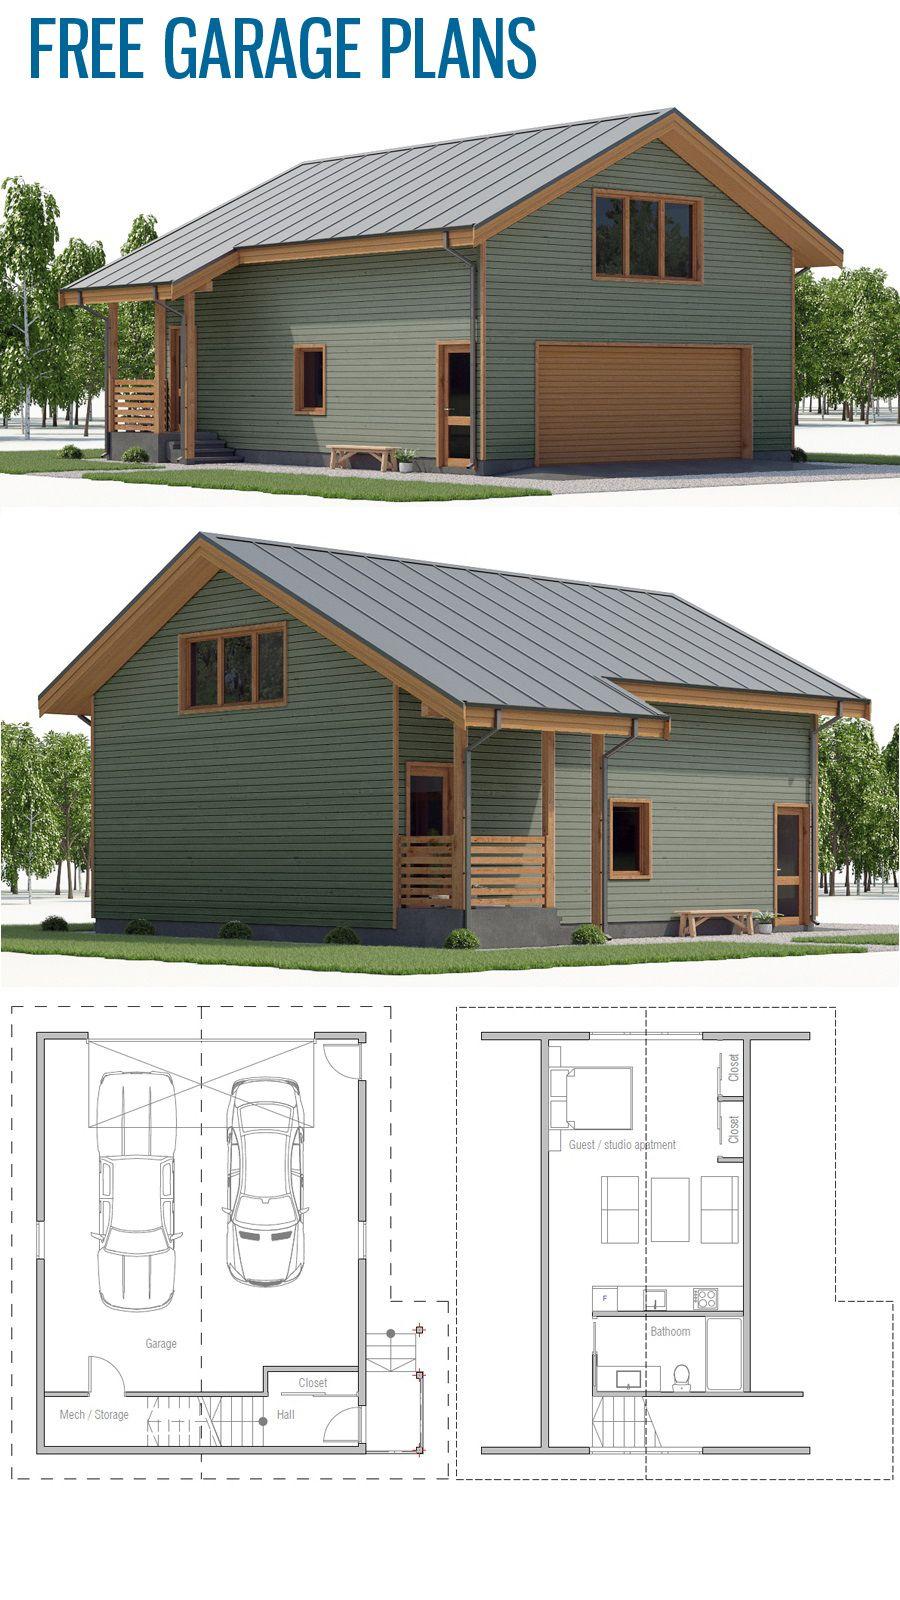 Free Garage Plans Carriage House Plans Garage Apartment Plans House Plans